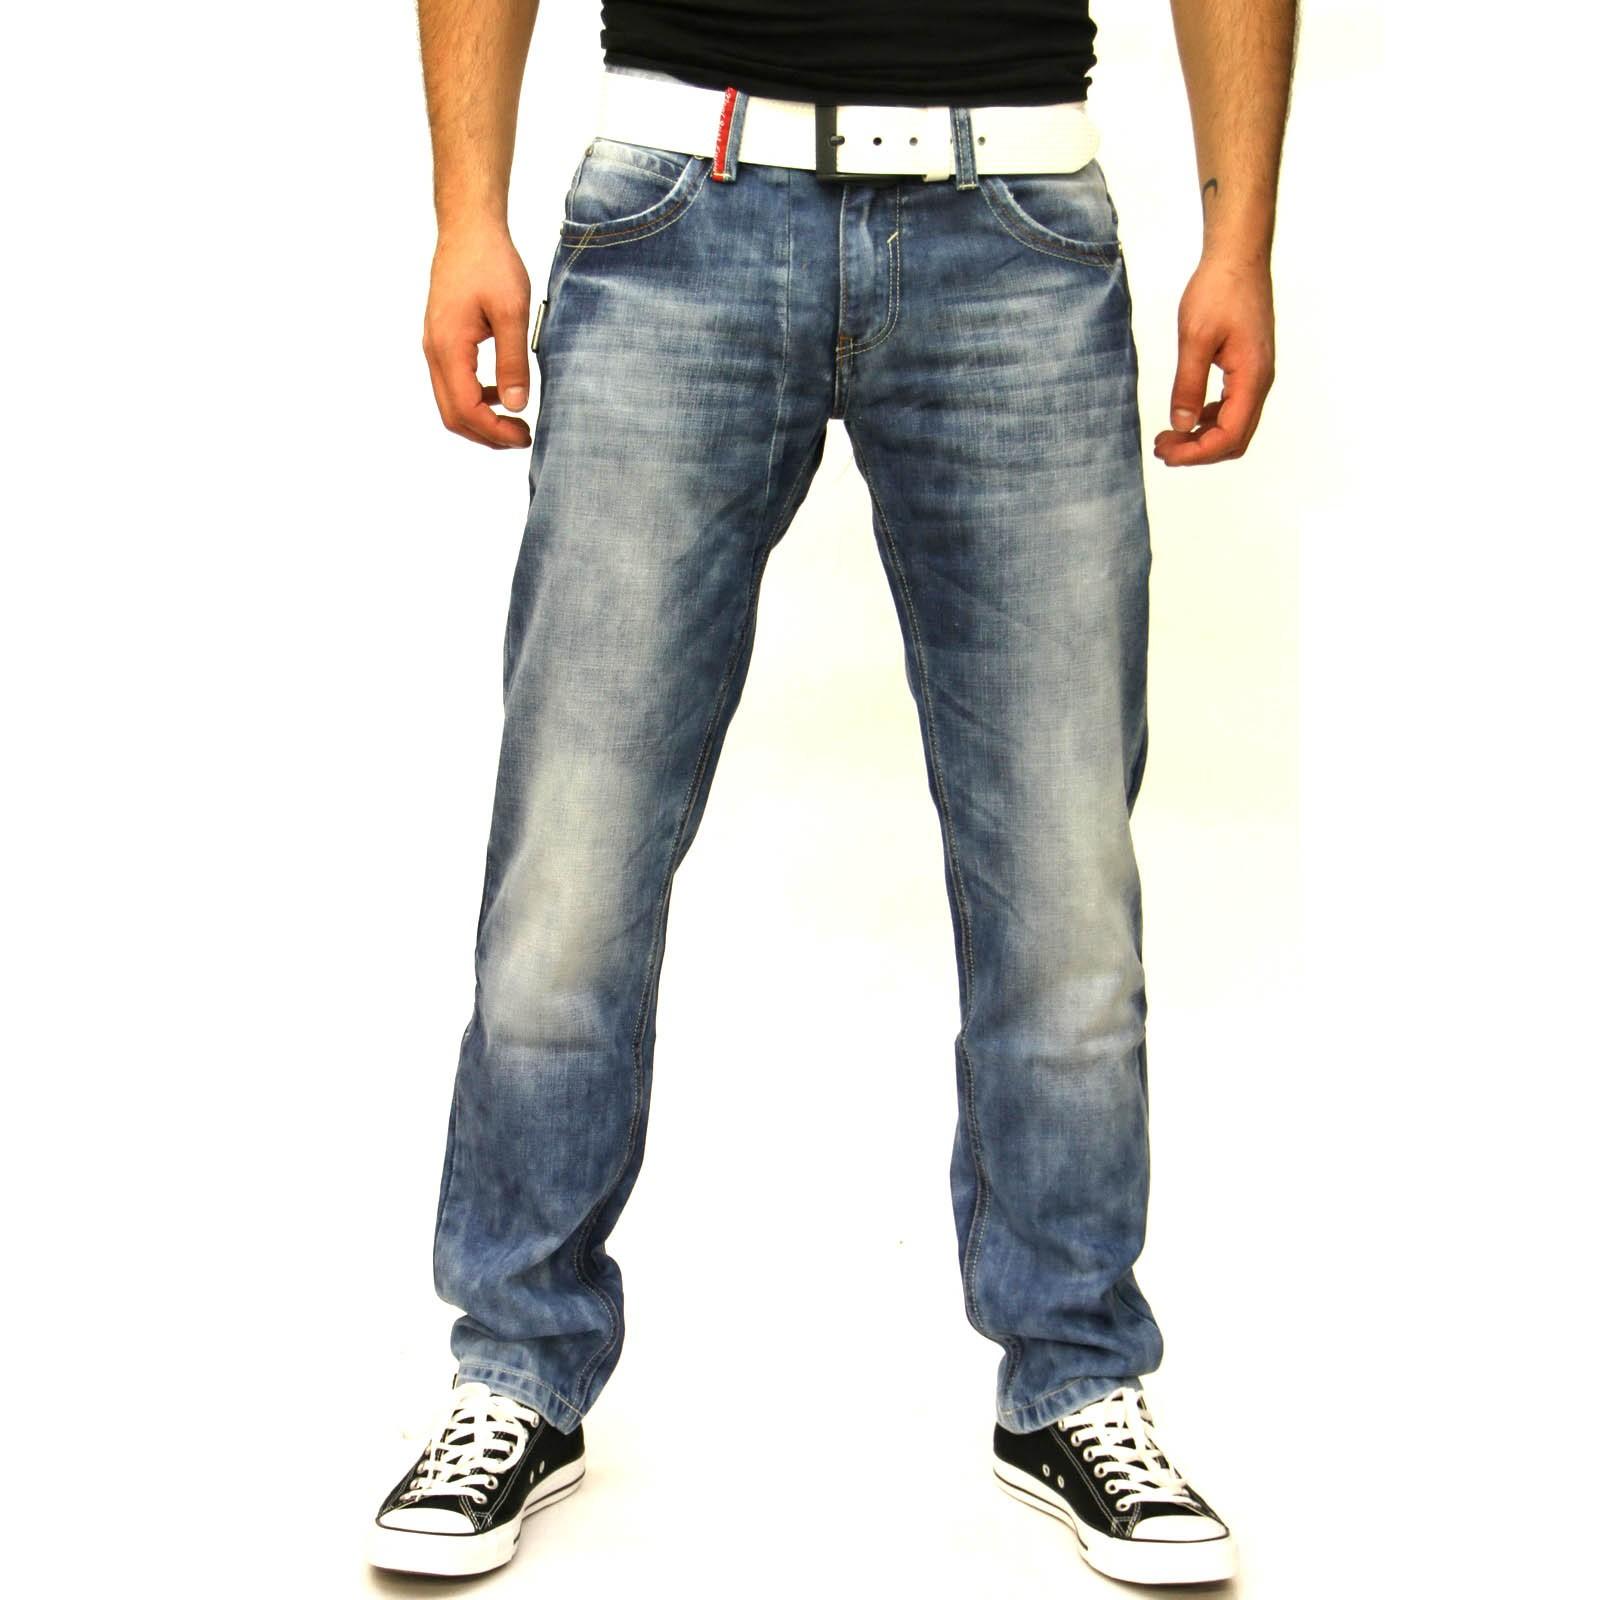 Herren Jeans Hose 7500 Rusty Neal